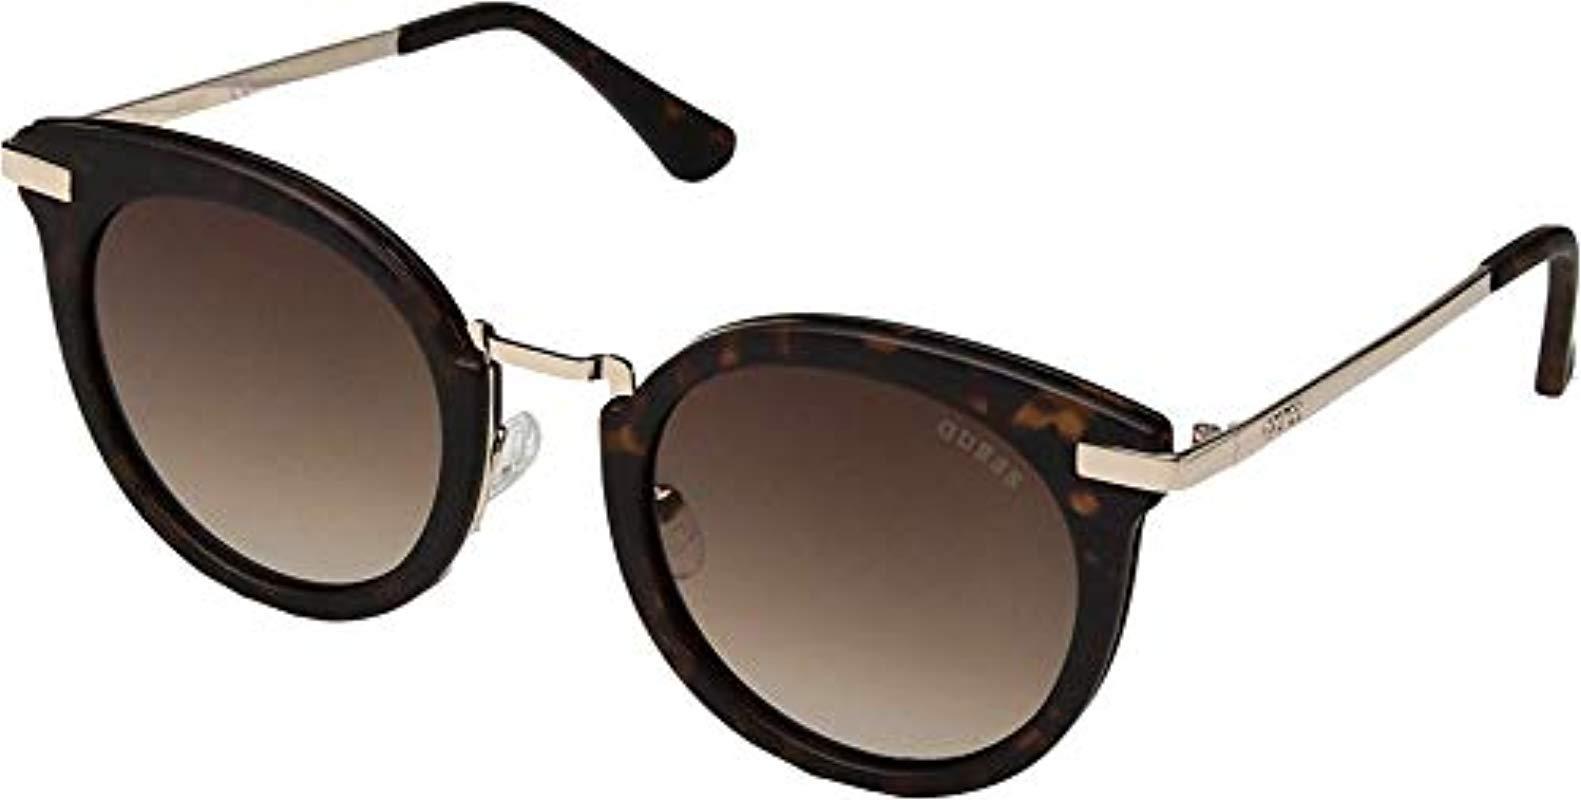 52786ffbd3428 Guess Gf6041-4952f Sunglasses